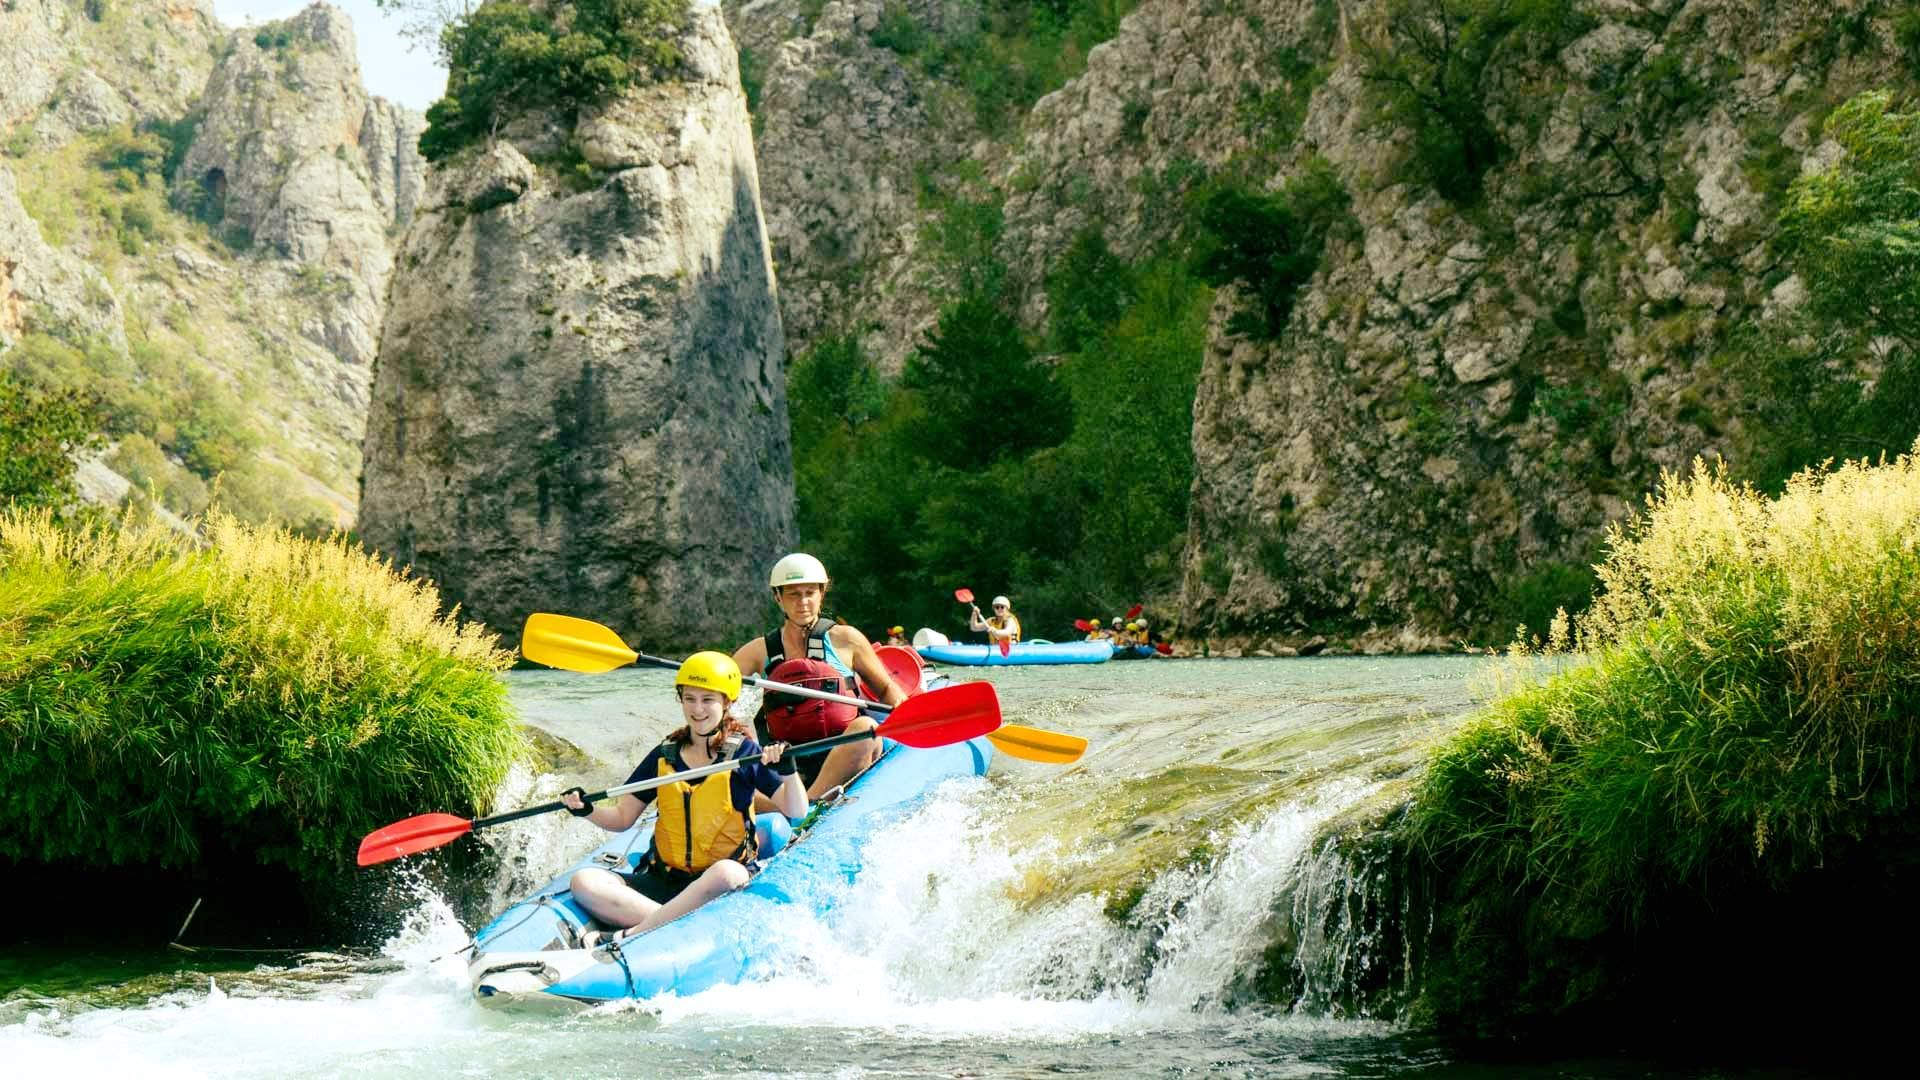 Raftrek Zrmanja River Adventures